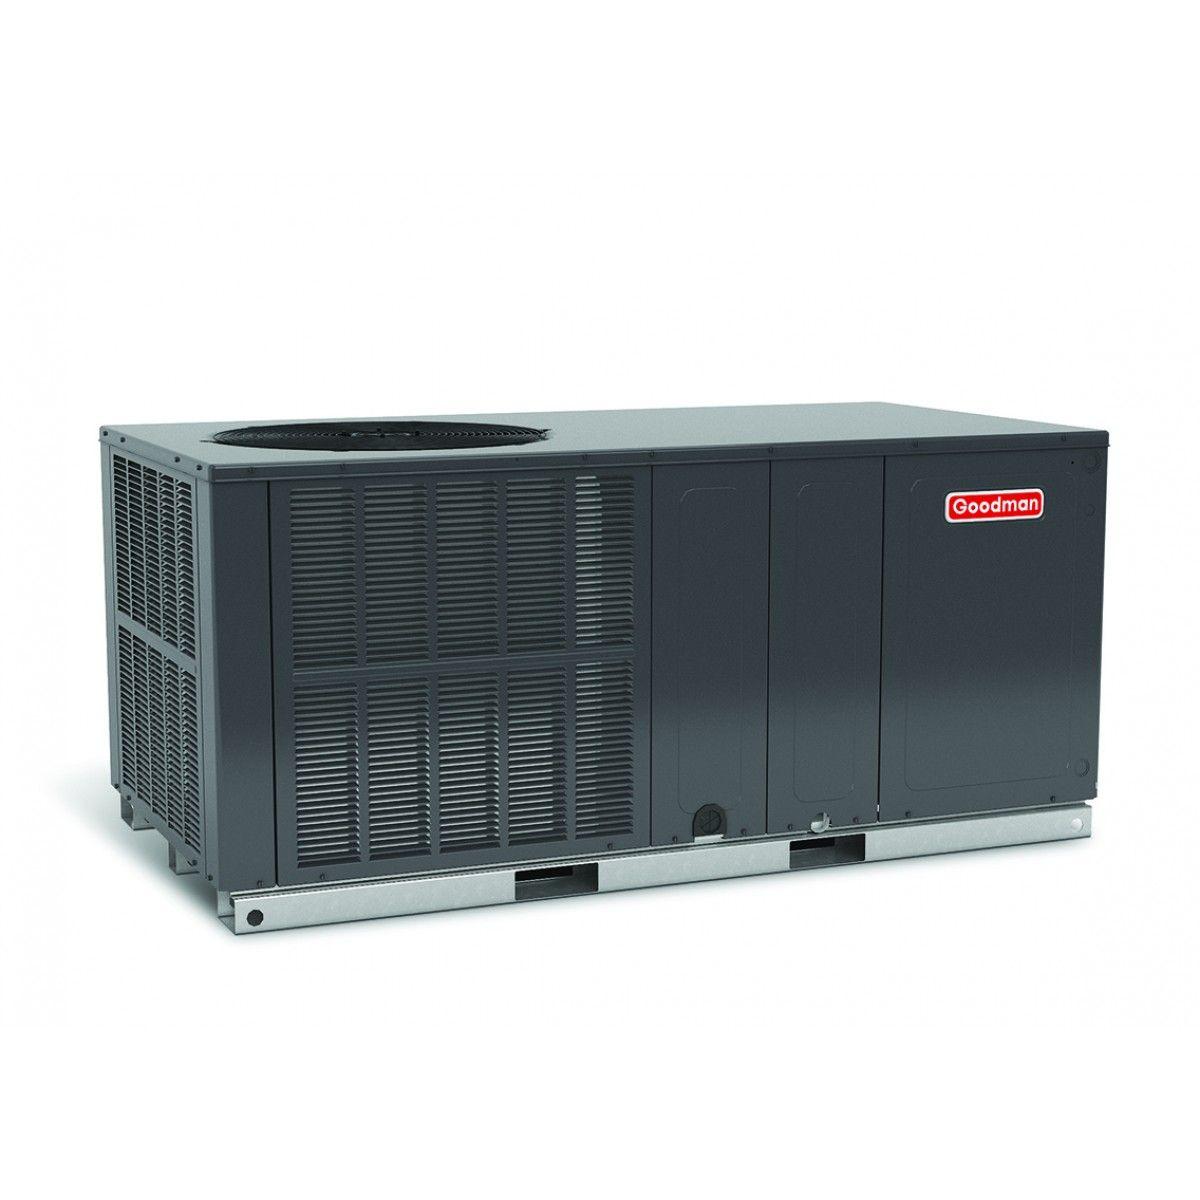 goodman 3 0 ton 14 seer heat pump package unit horizontal more views